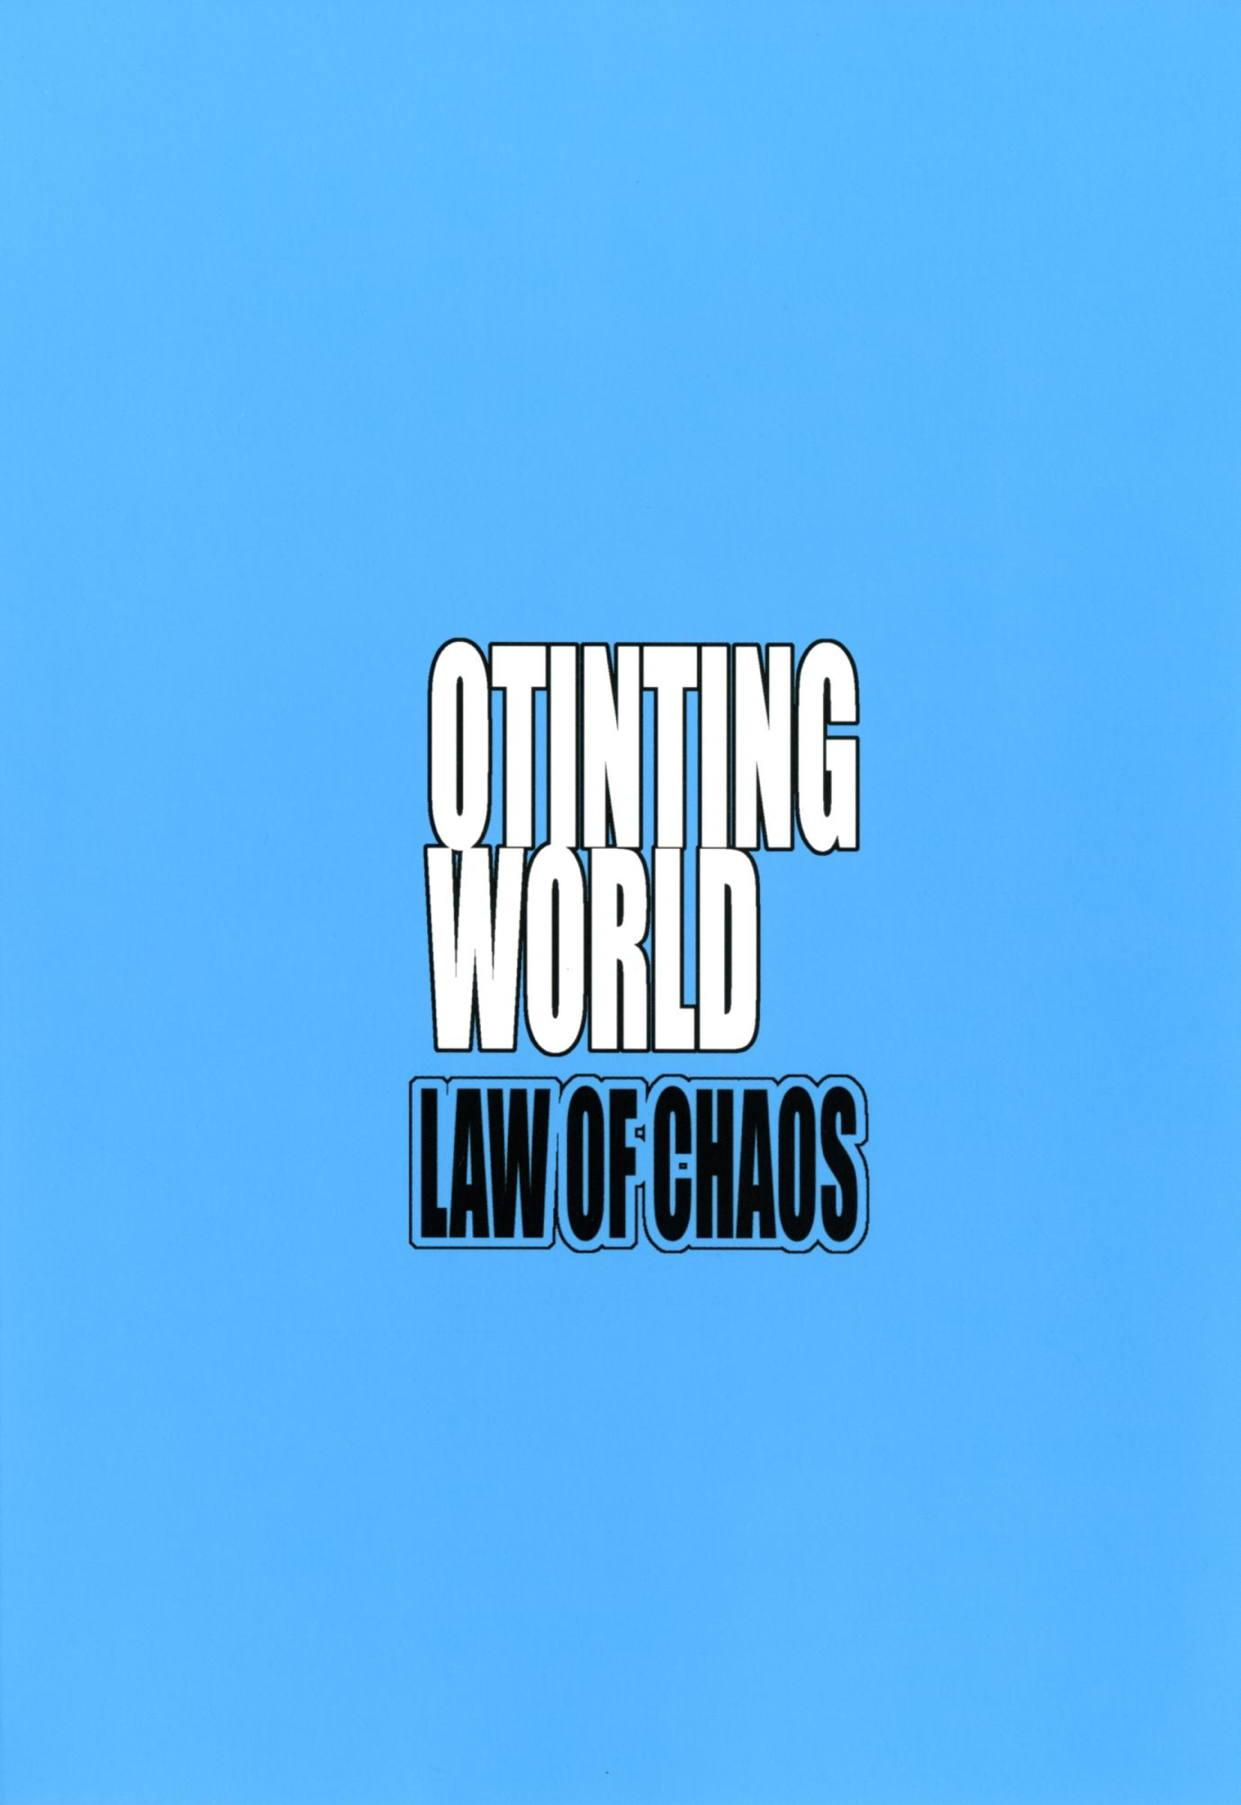 OTINTING WORLD 29